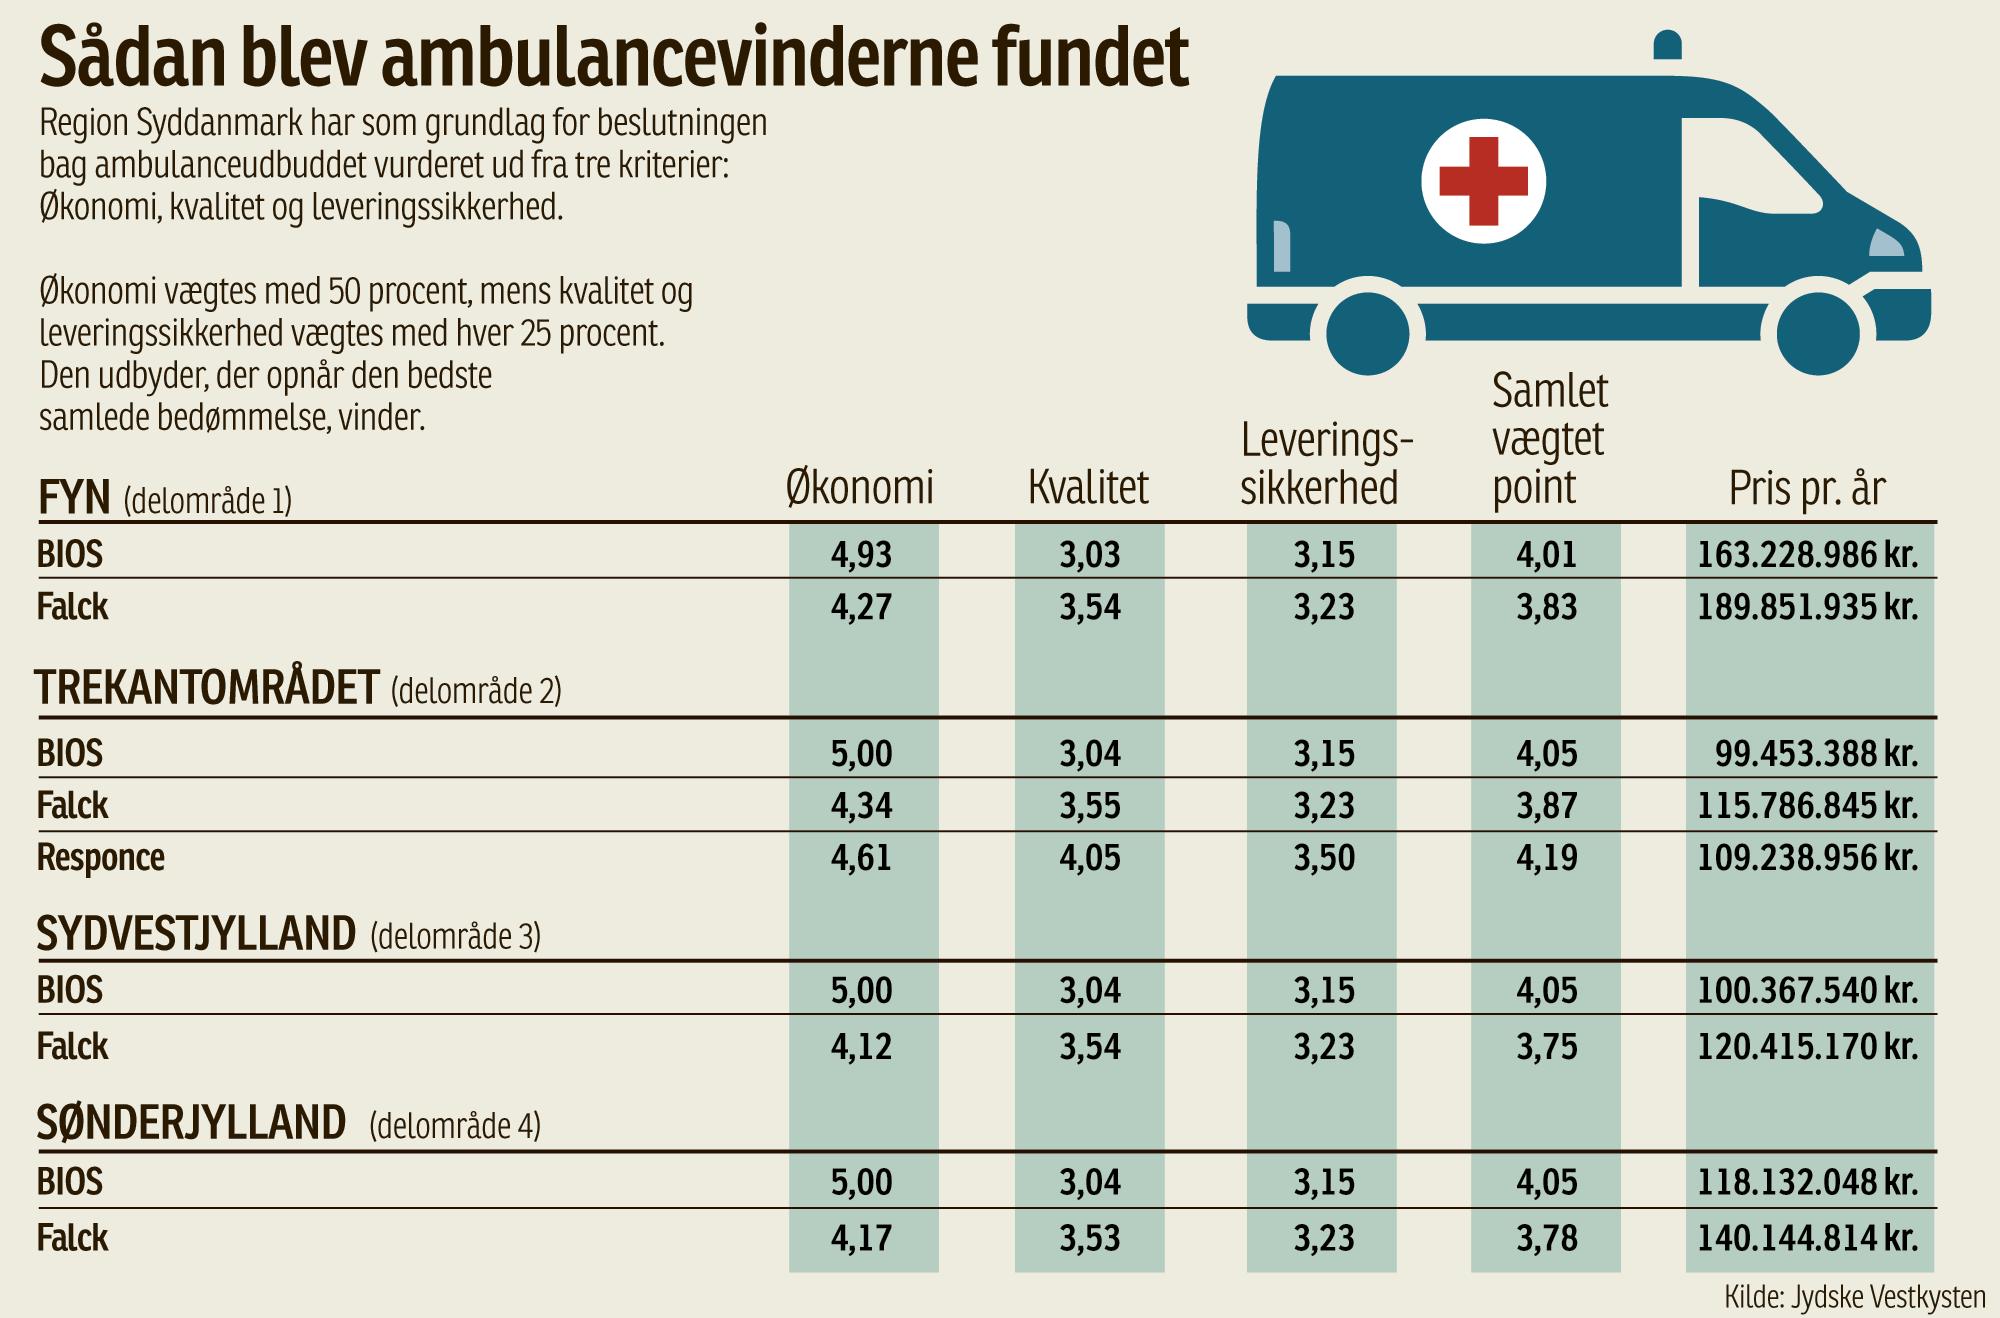 bios ambulance service danmark